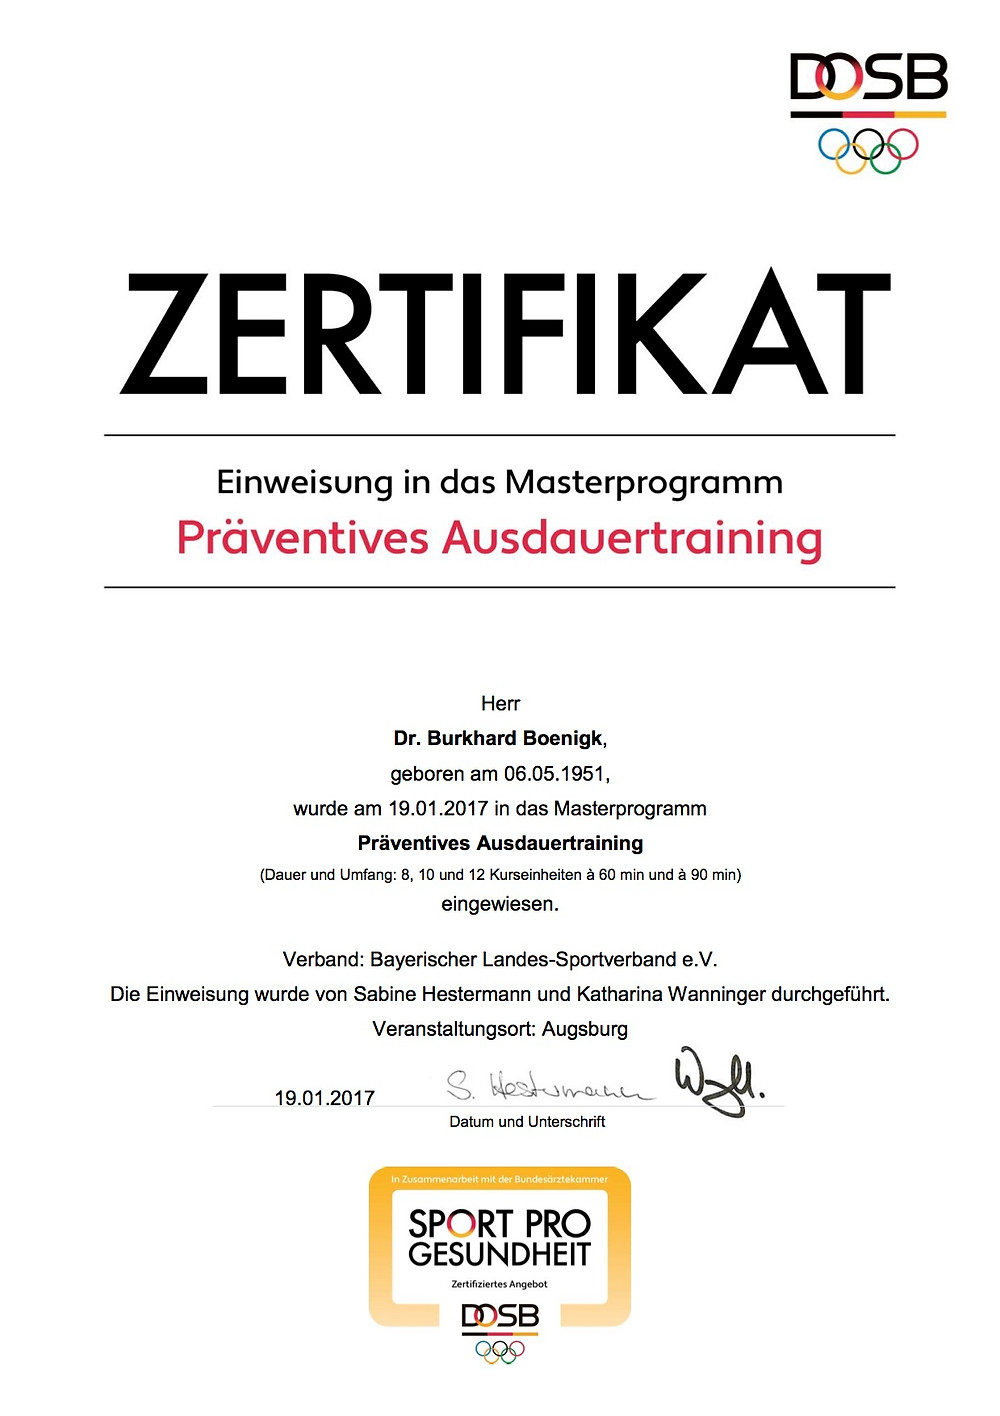 Laufinstinkt+ Schwaben Augsburg - DOSB-Zertifikat Präventives Ausdauertraining